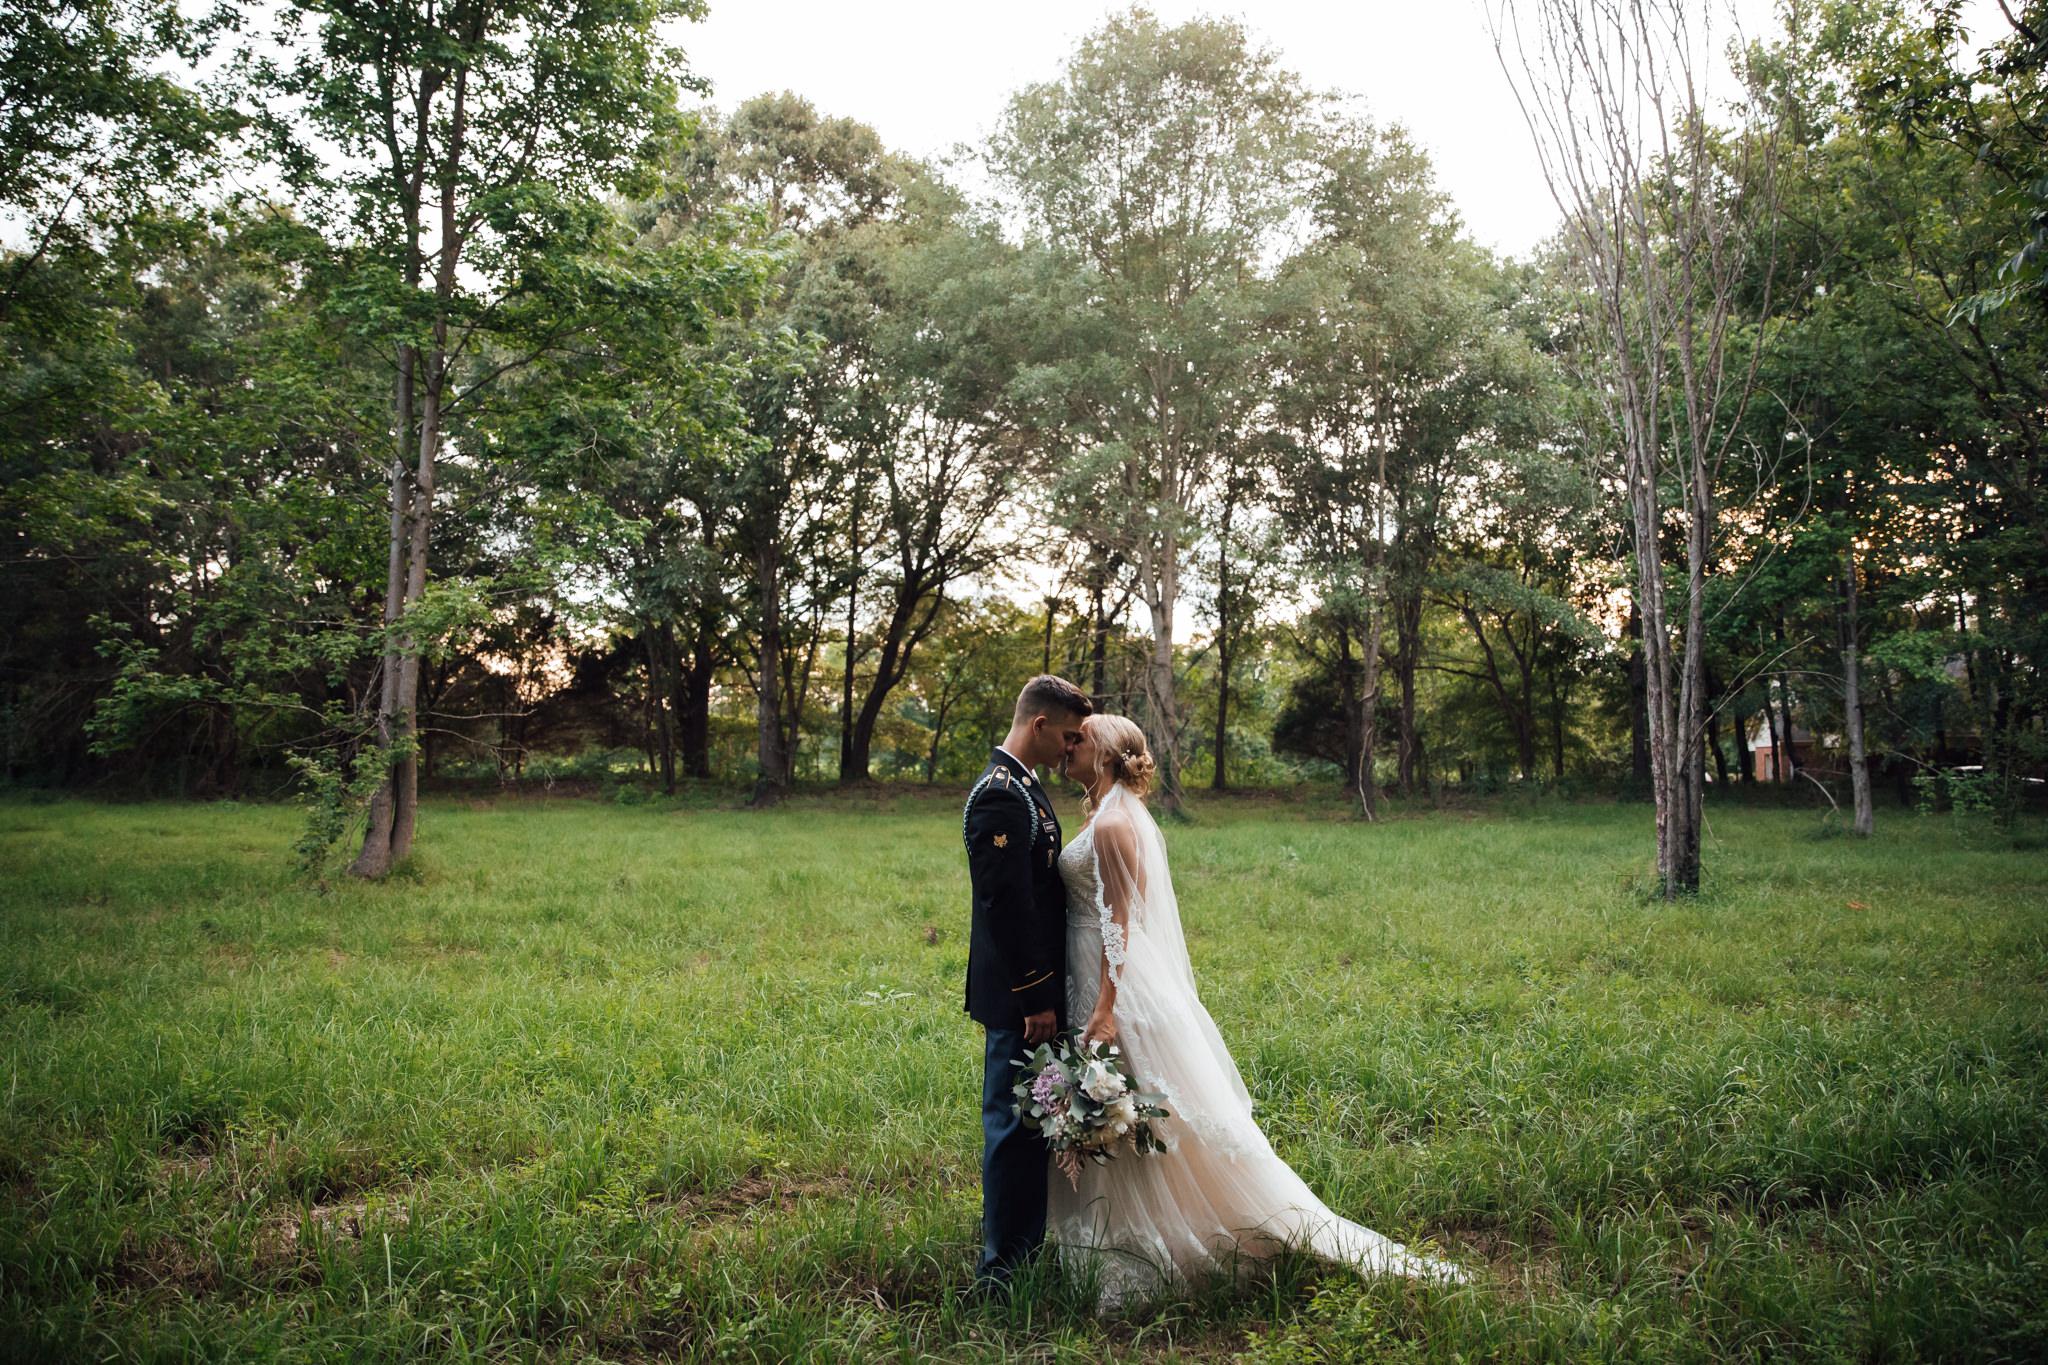 backyard-wedding-thewarmtharoundyou-lexy-branson-76.jpg